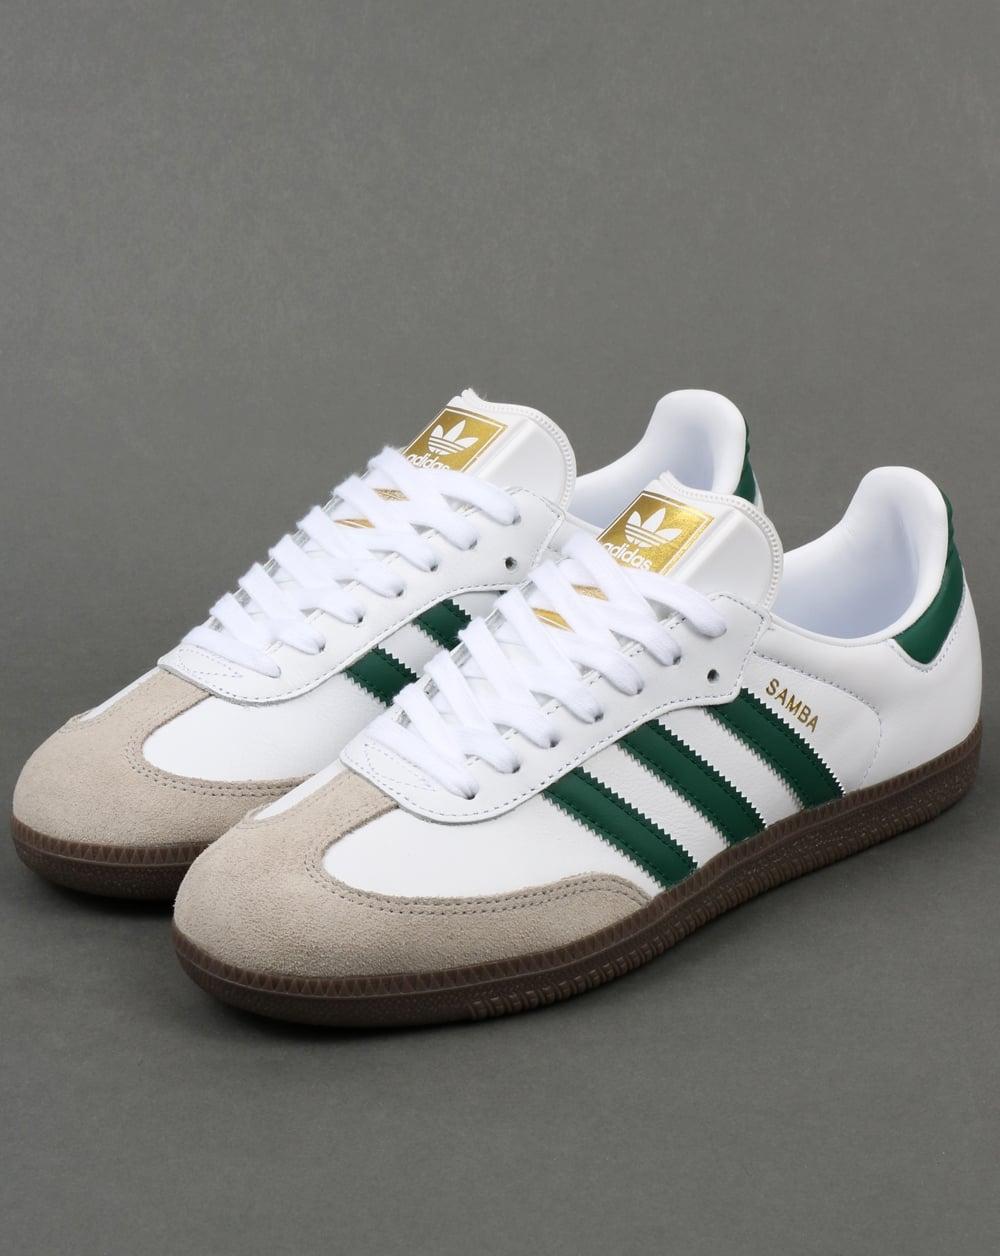 6d2554949a49 Adidas samba white green   Actual Store Deals